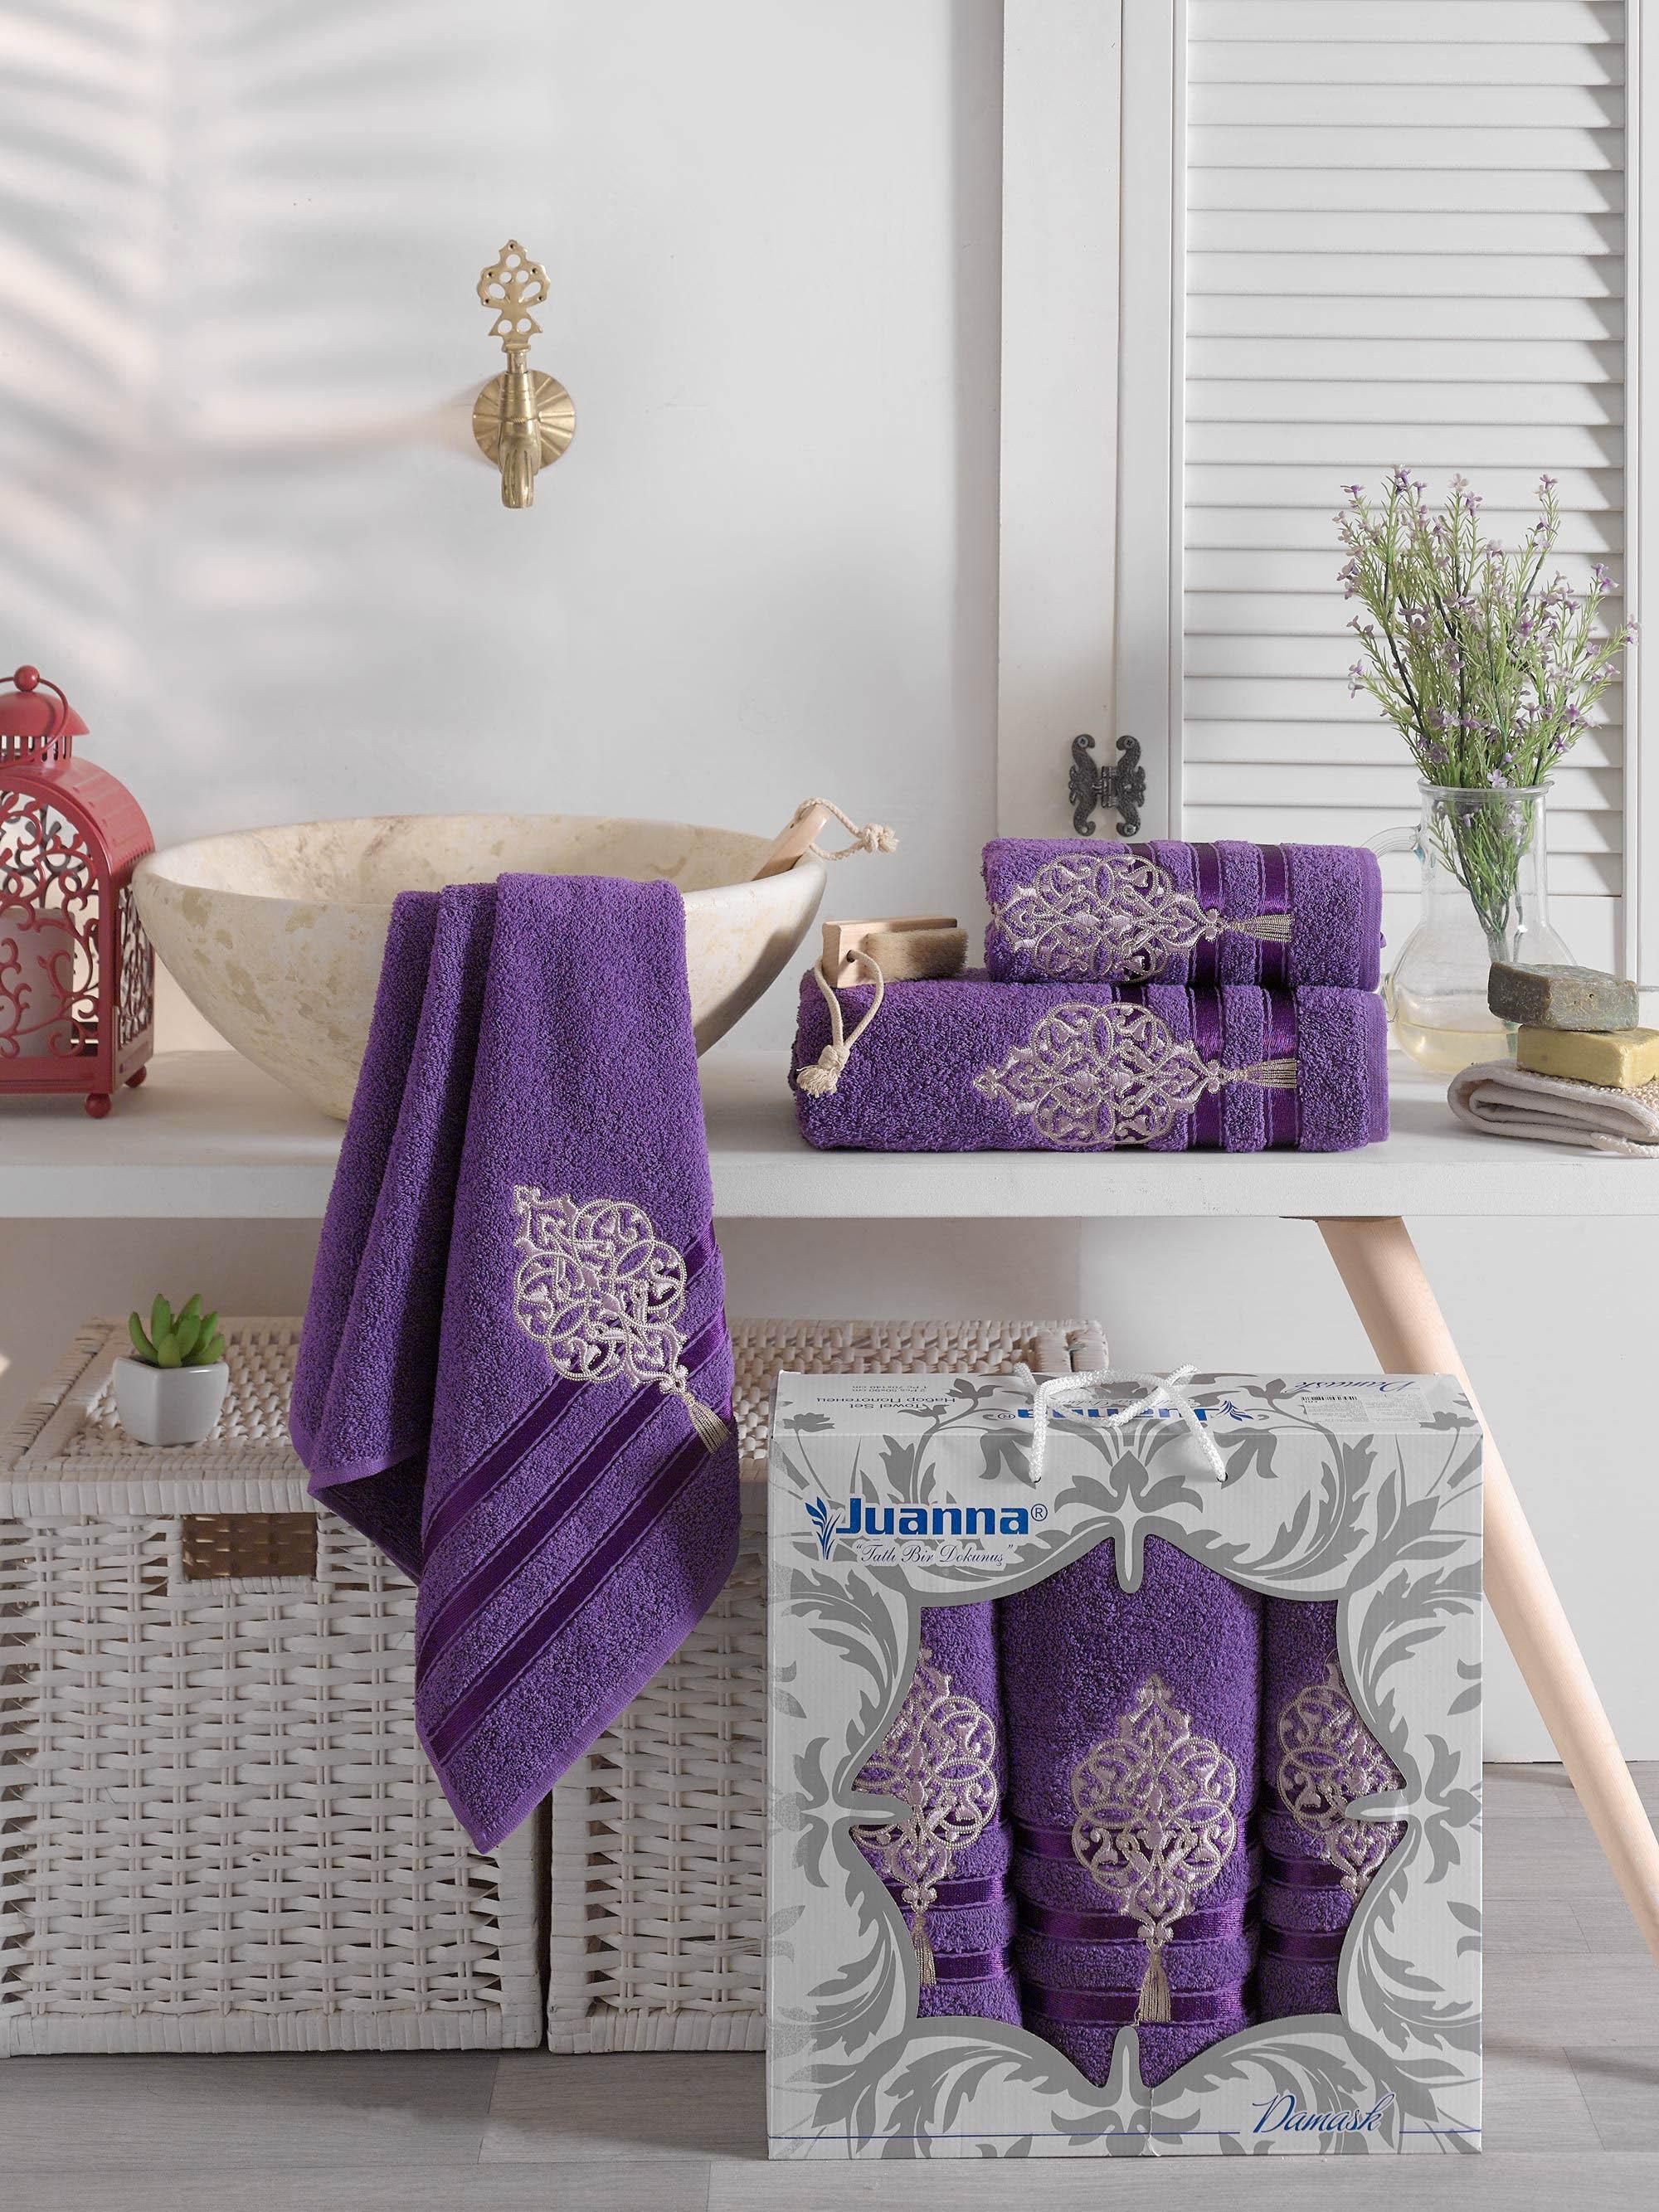 Купить Полотенца Juanna, Полотенце Damask Цвет: Баклажан (50х90 см - 2 шт, 70х140 см), Турция, Махра